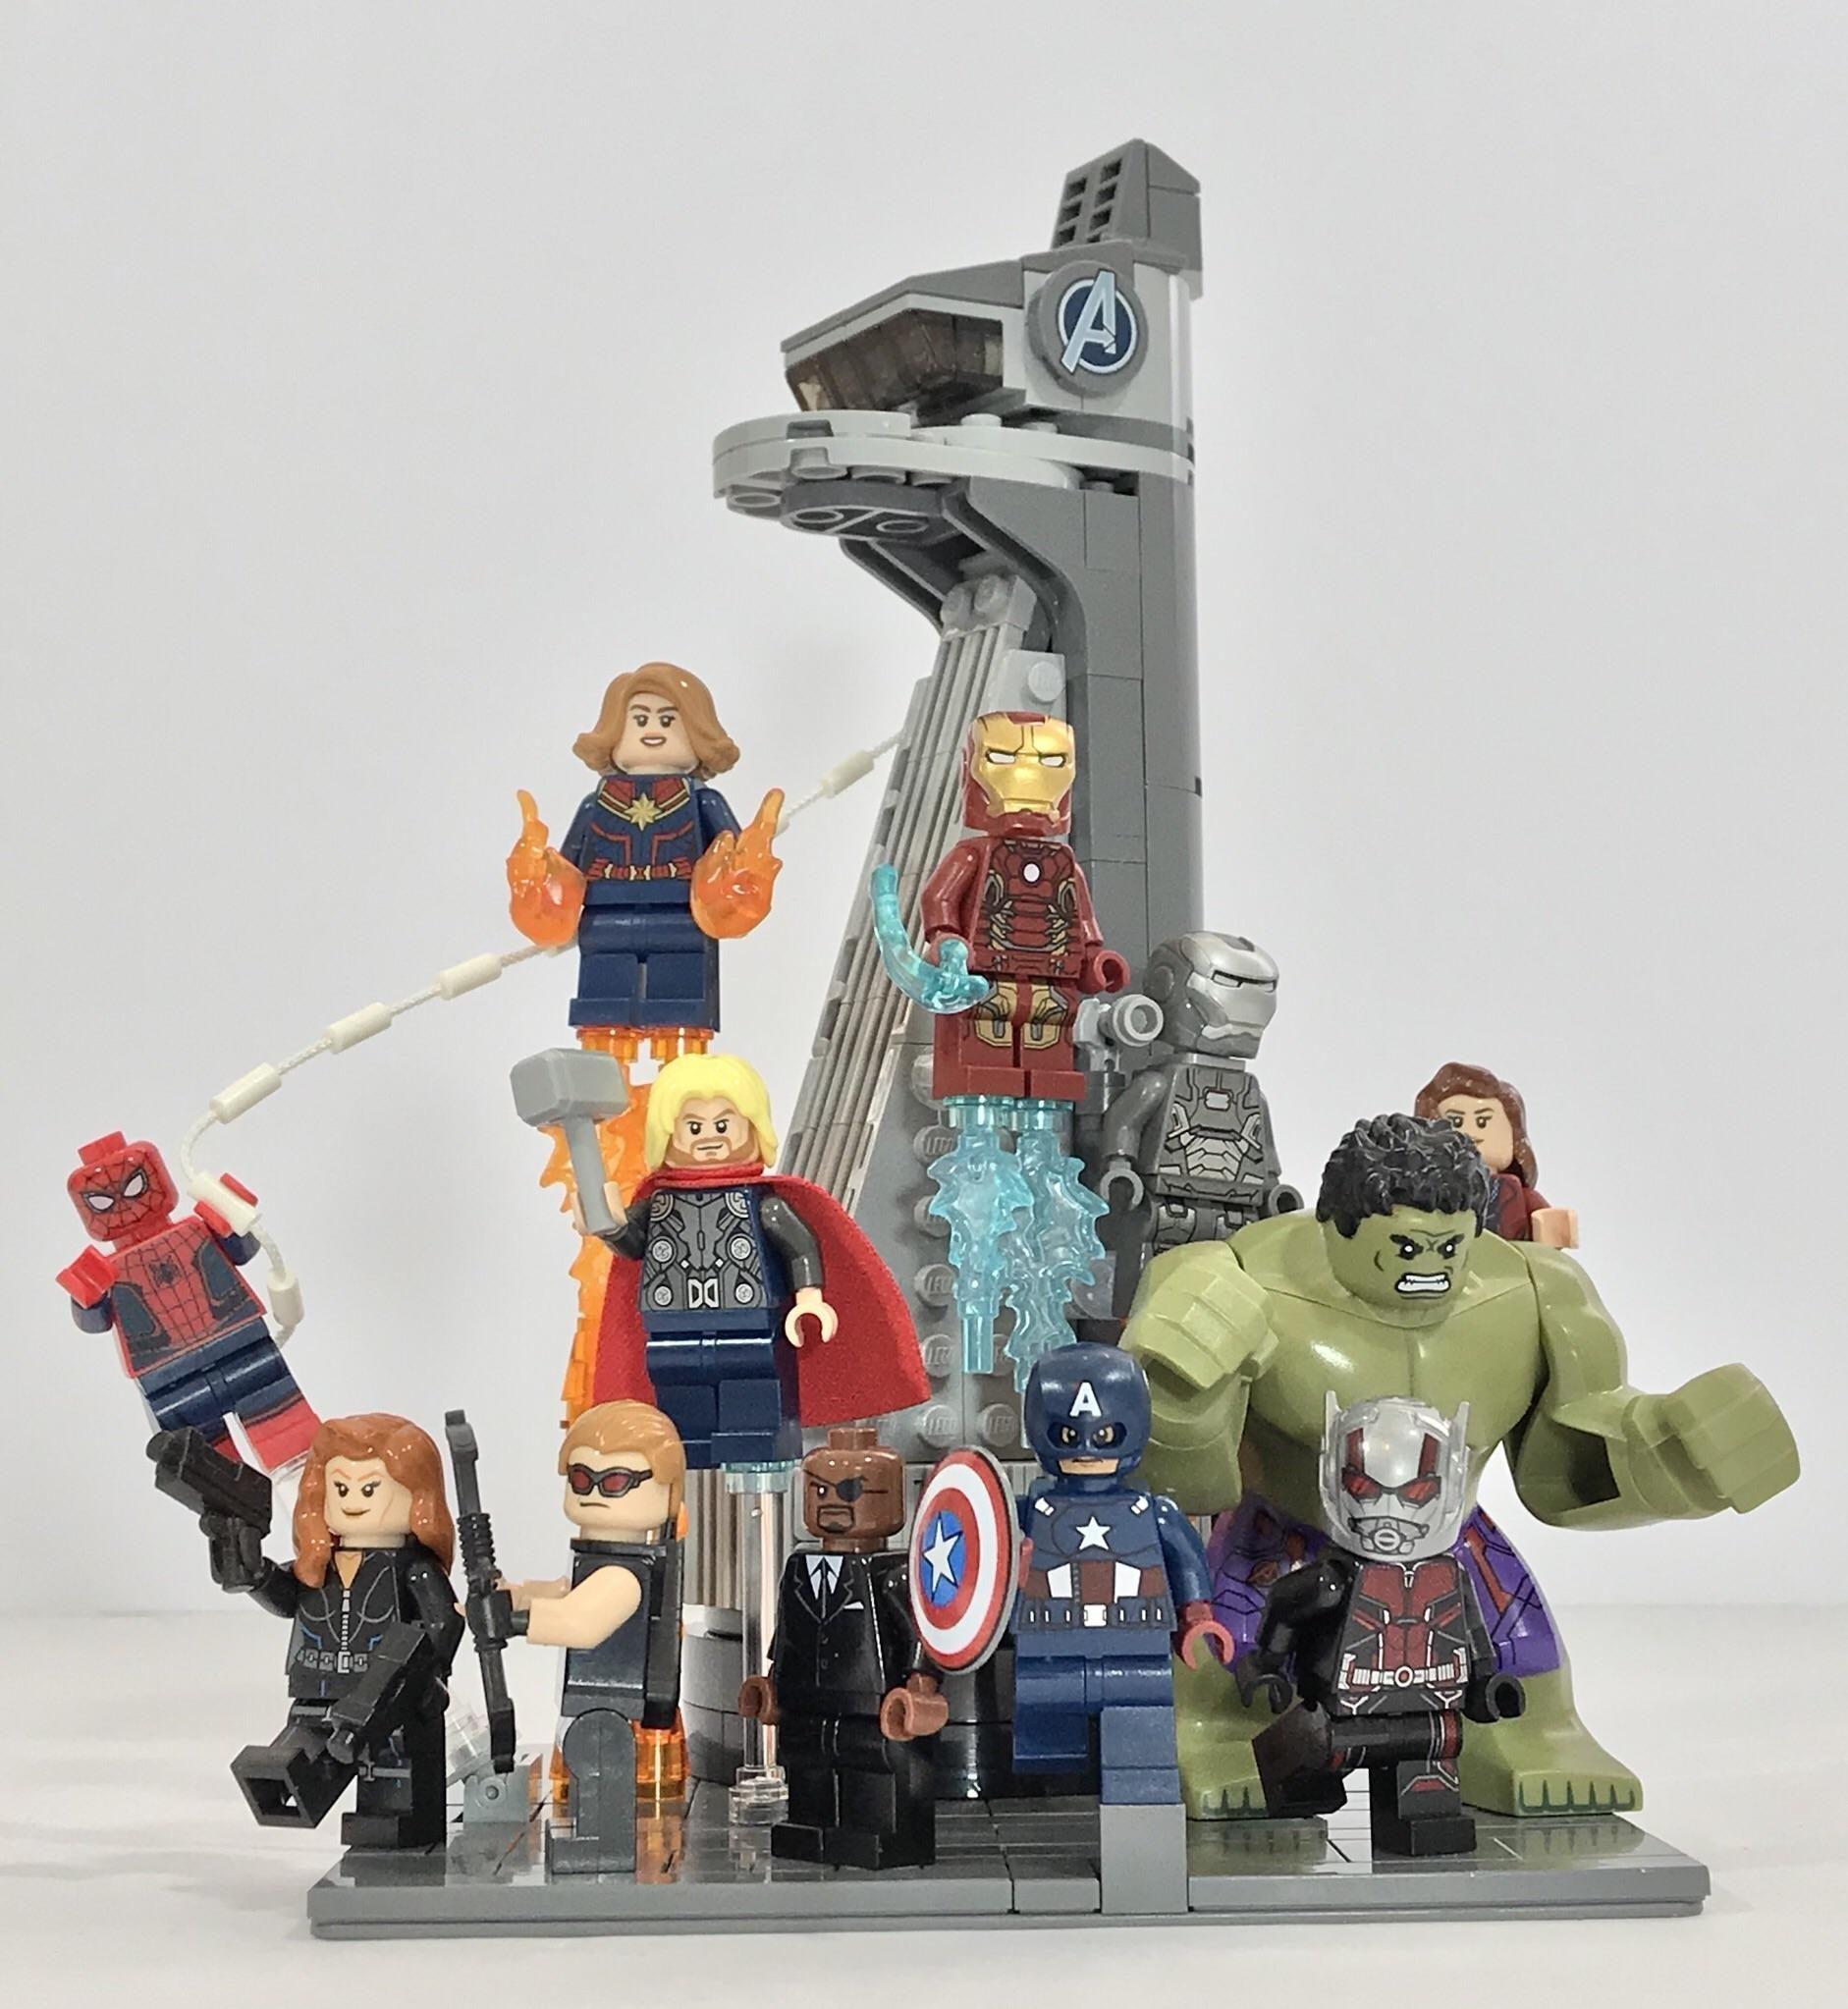 Earth S Mightiest Heroes Lego Lego Pictures Amazing Lego Creations Lego Custom Minifigures